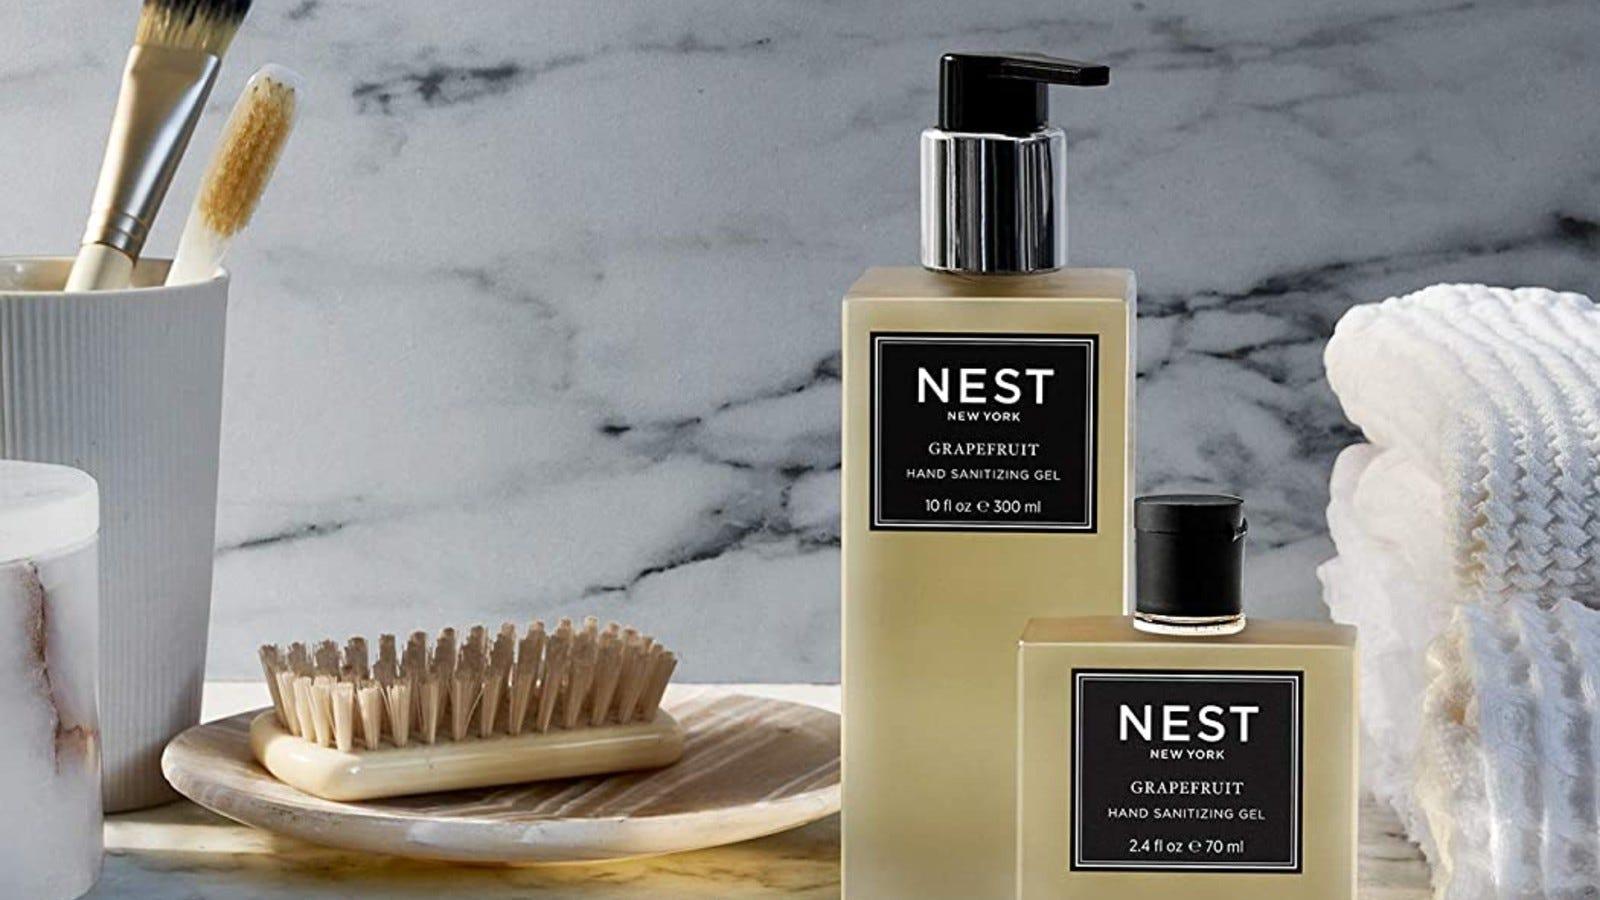 Nest hand sanitizer on a bathroom shelf